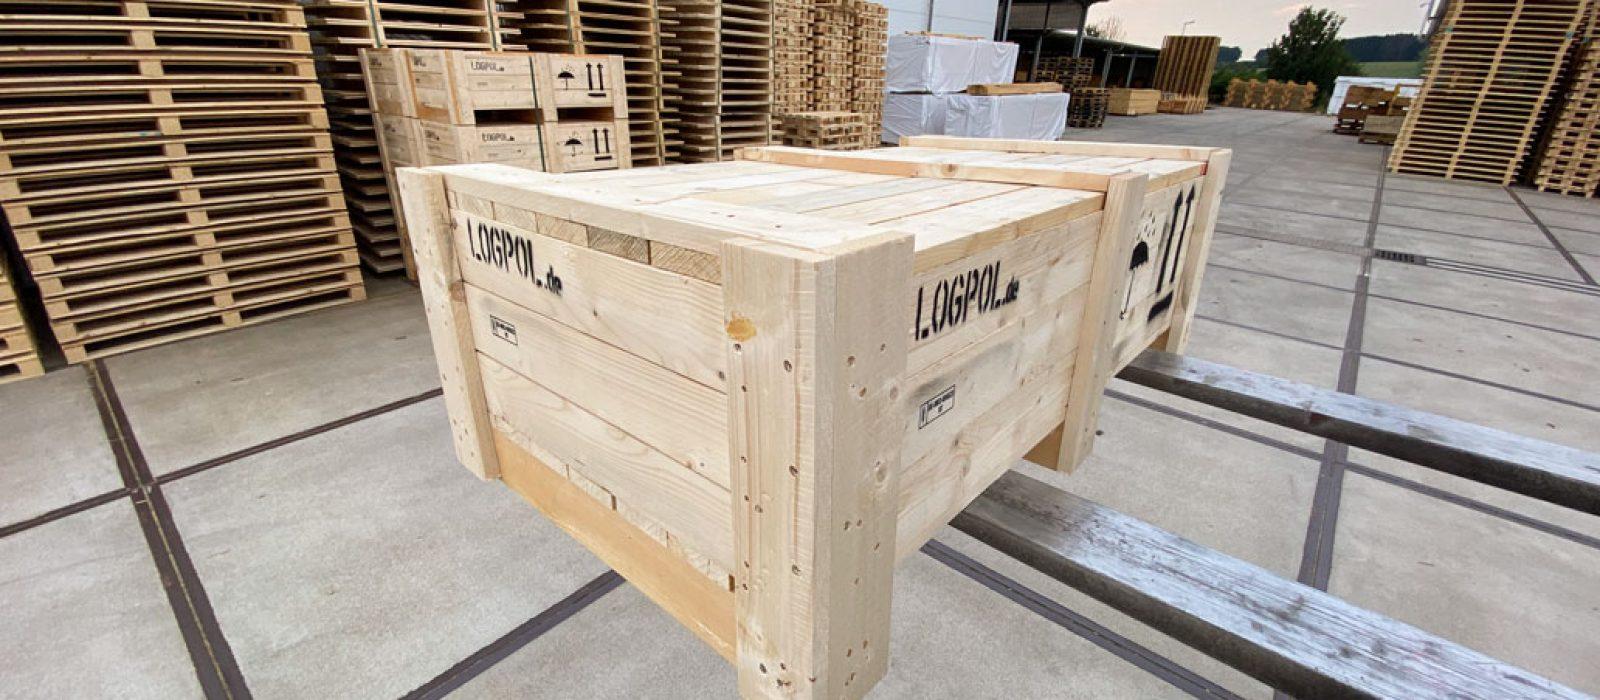 Kiste-1200x600x300-mm-LOGPOL